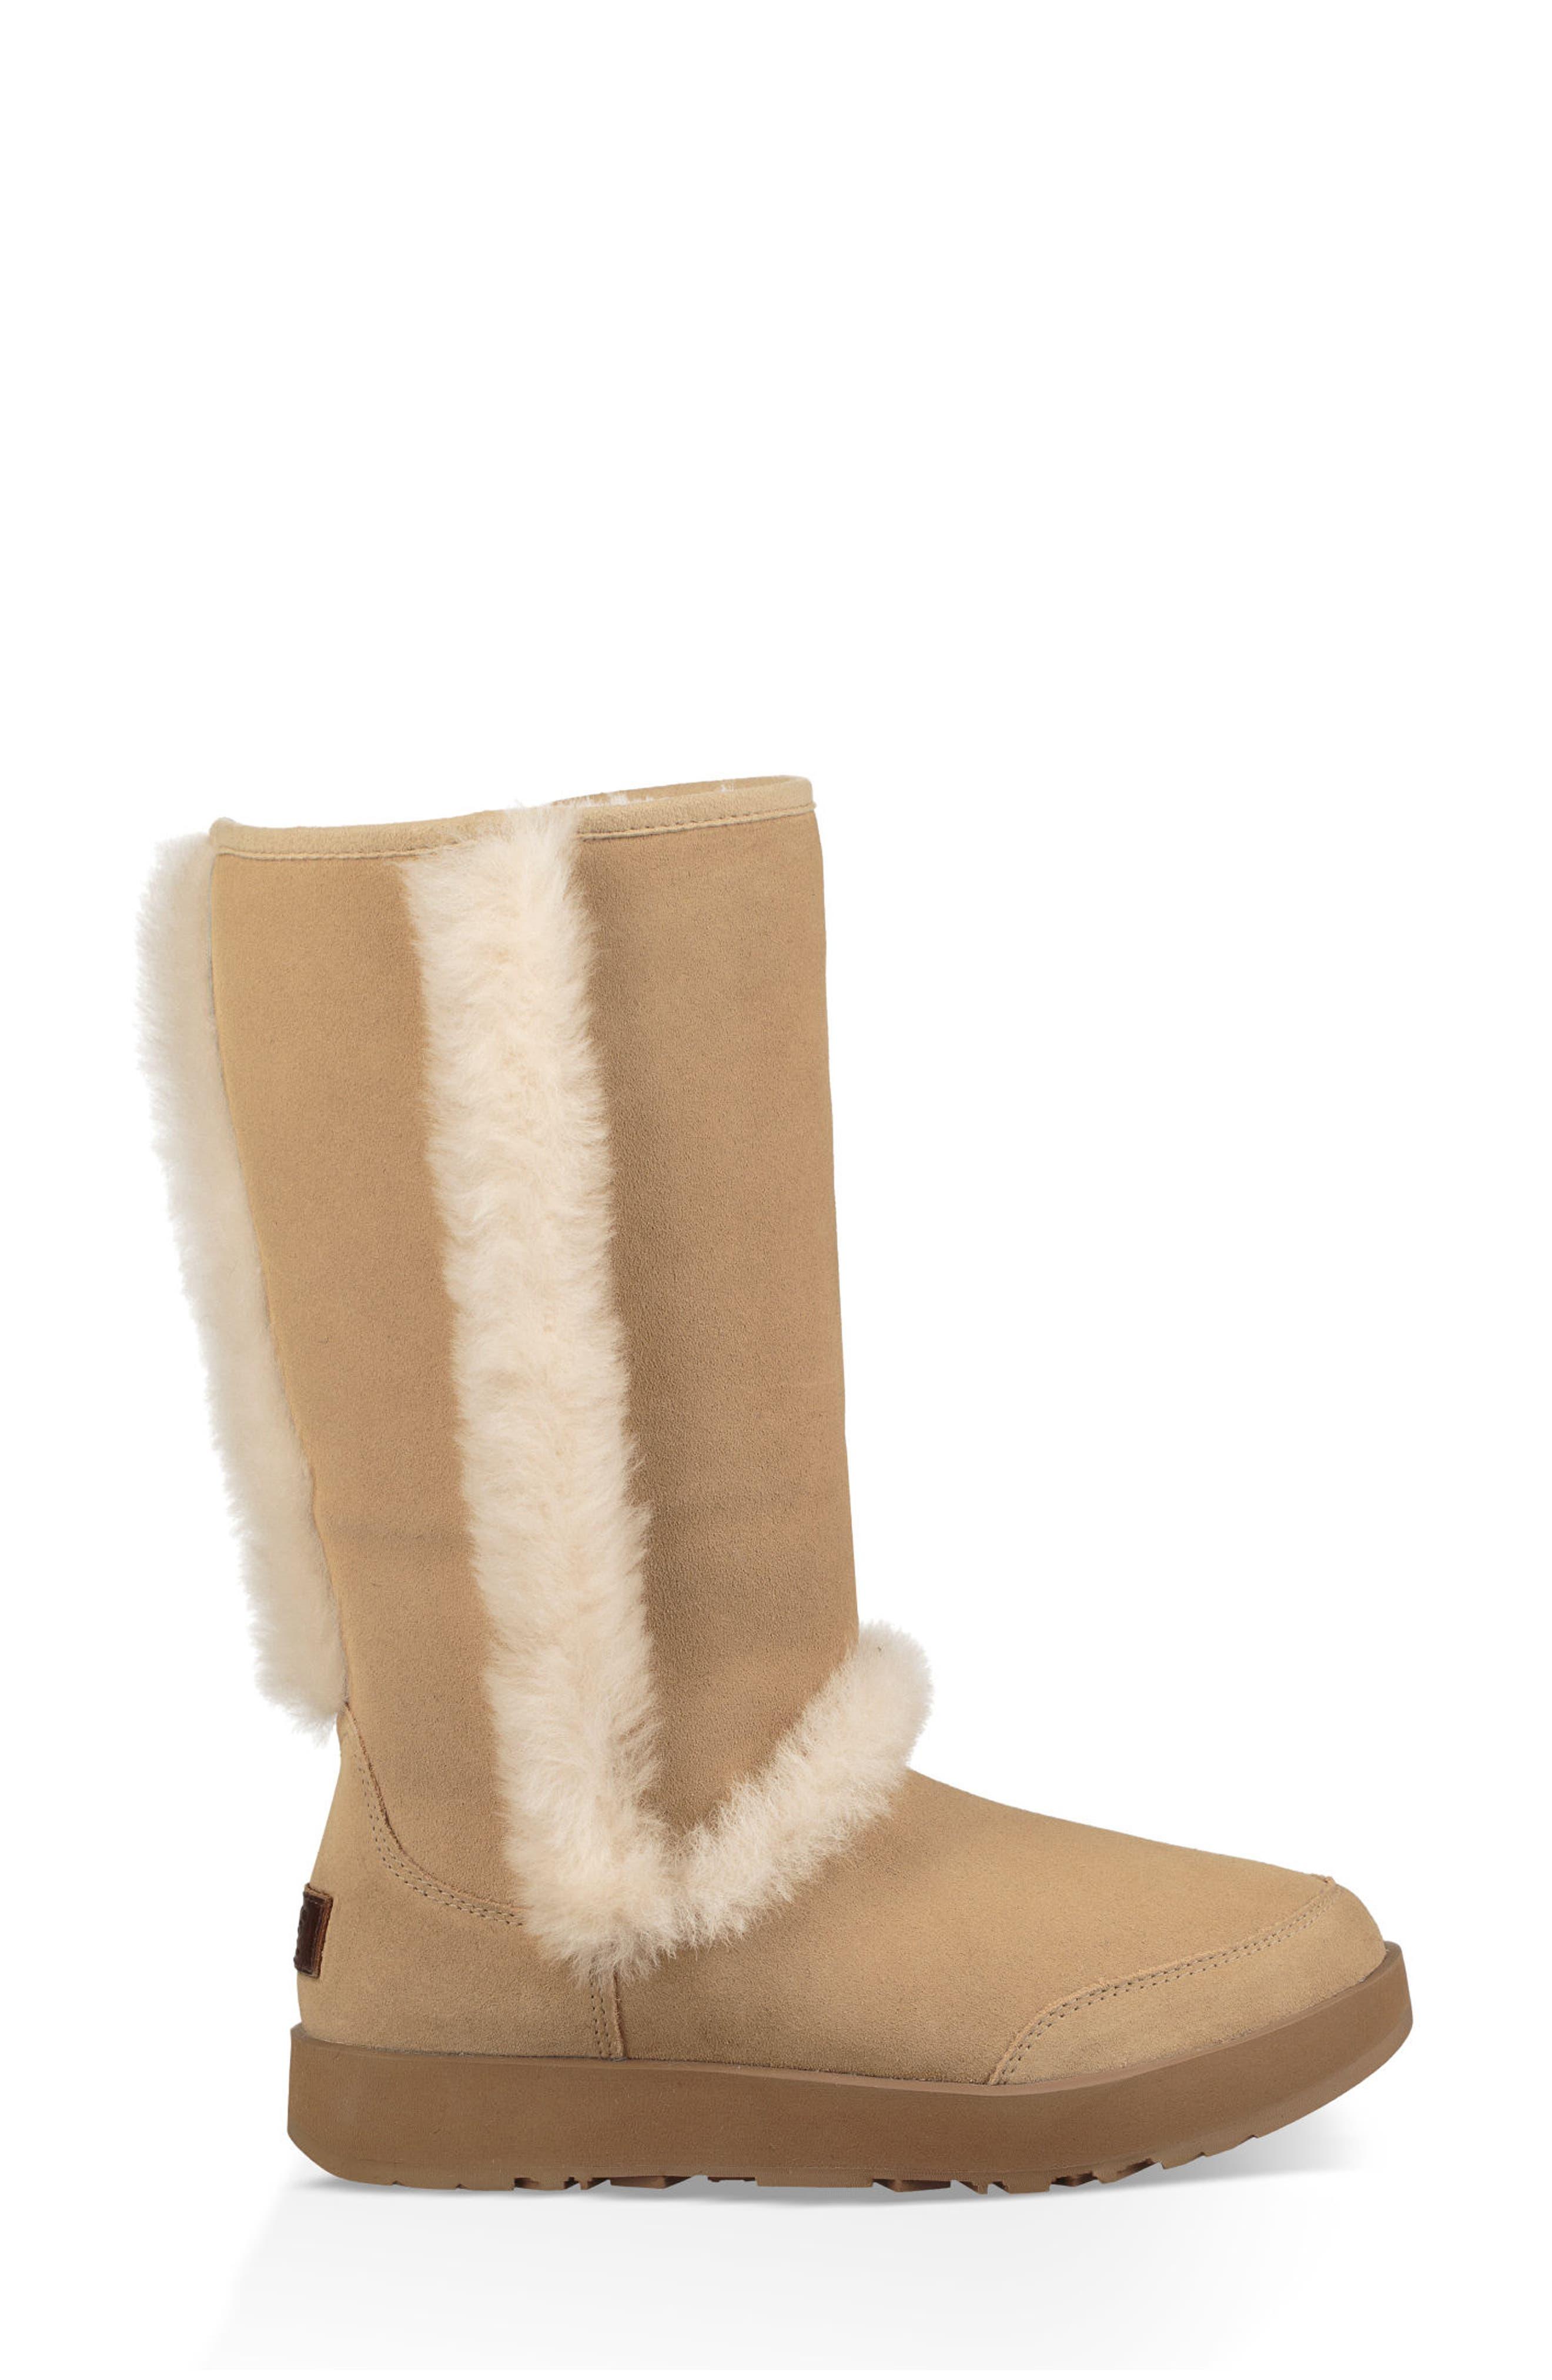 Sundance Genuine Shearling Waterproof Boot,                             Alternate thumbnail 4, color,                             Sand Suede